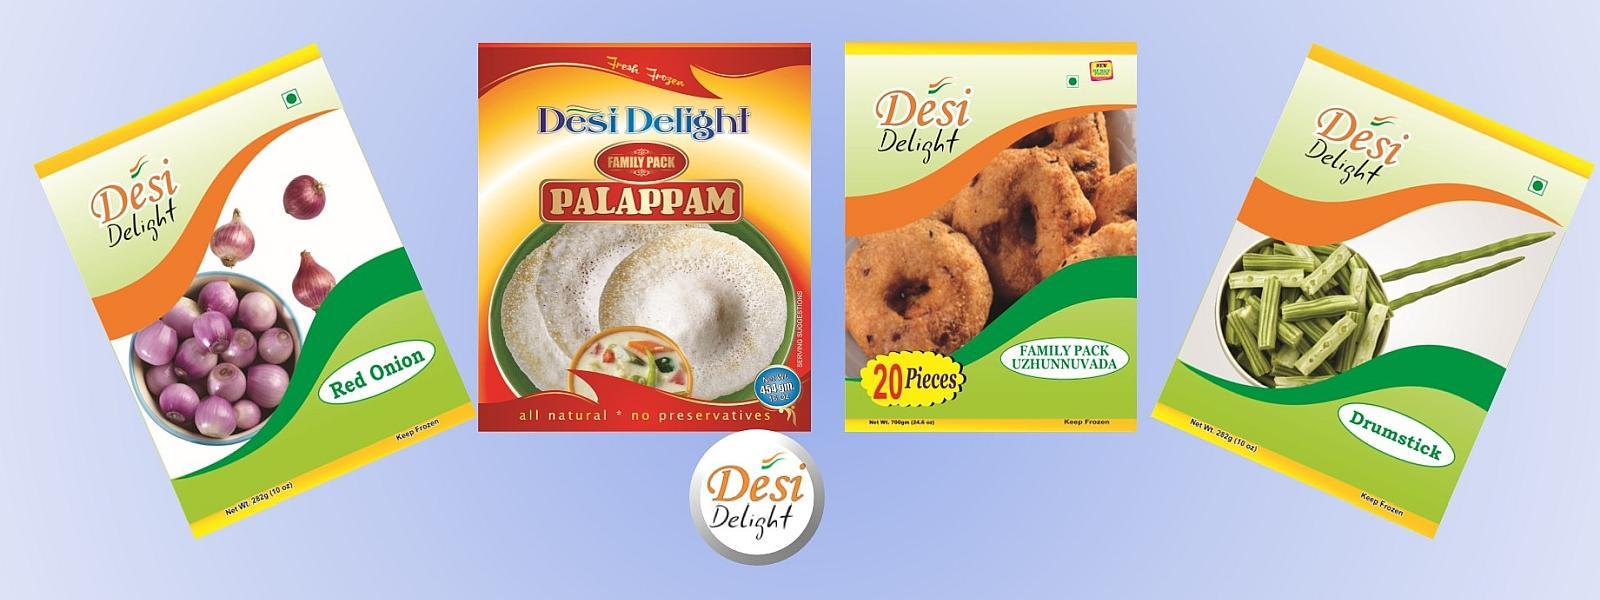 Parayil Group - Desi Delight